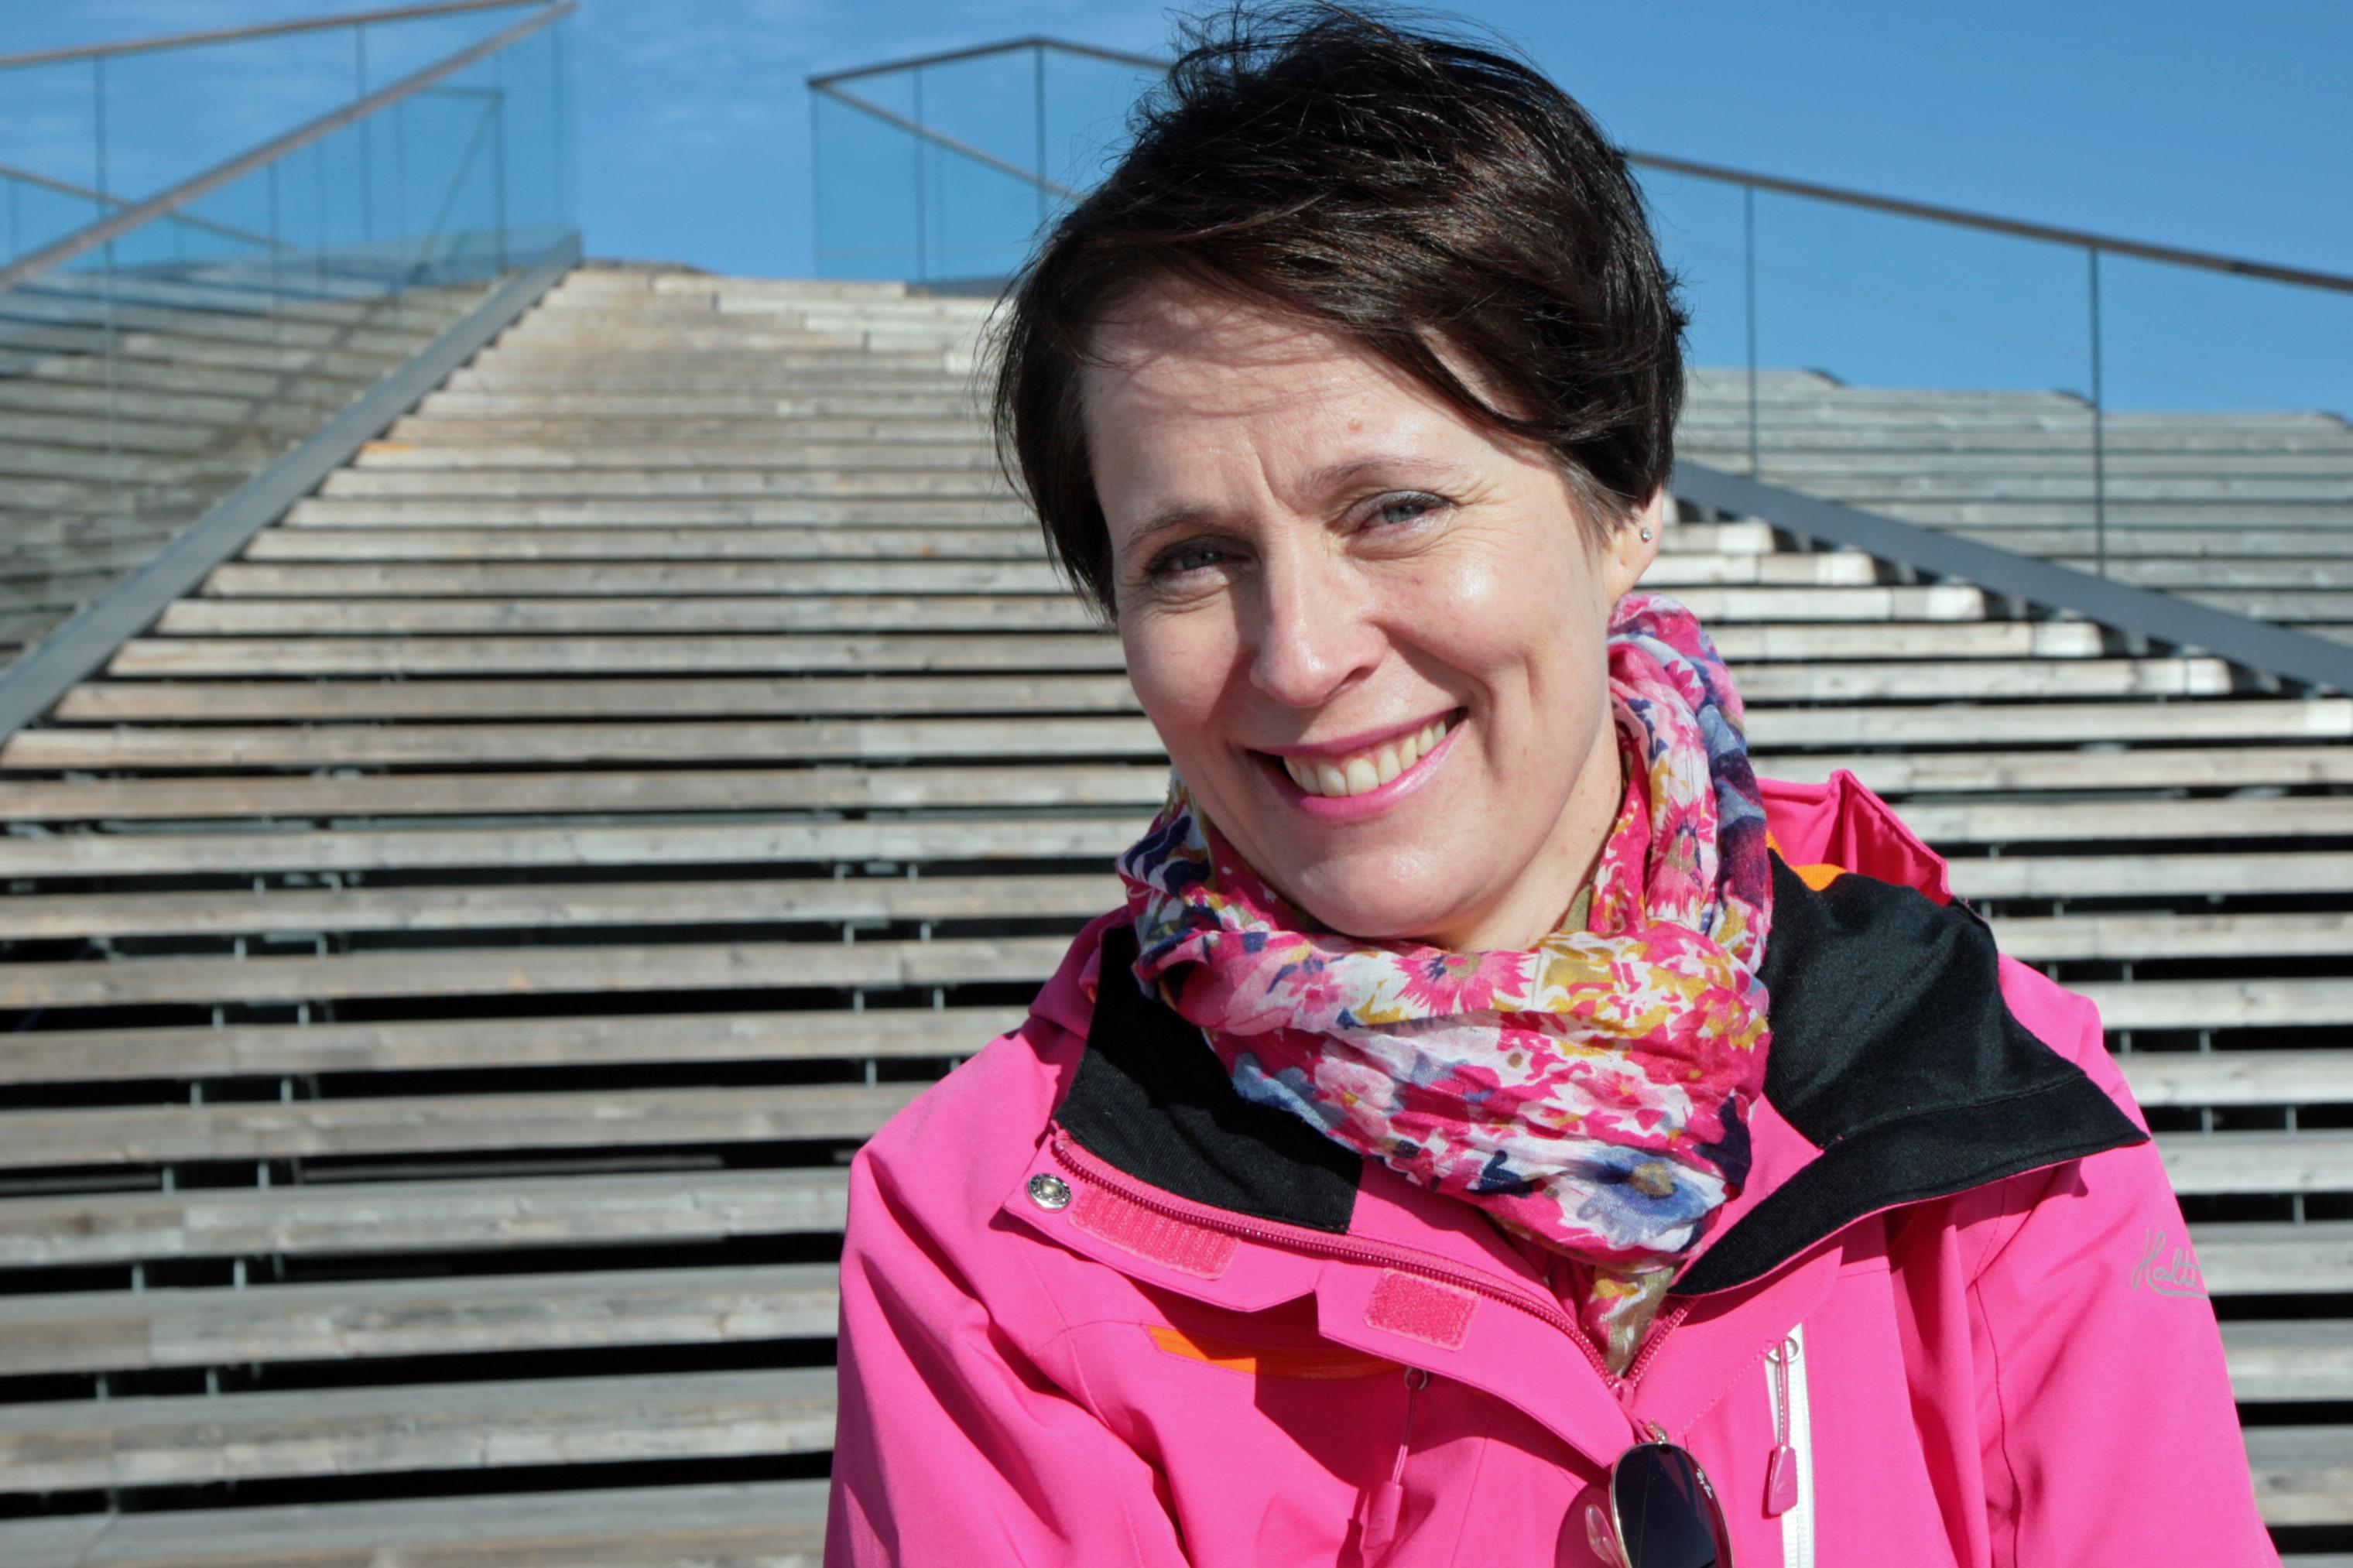 Katja Lähtinen became the first Professor of Business Economics and Wood Construction at the University of Vaasa last autumn. Photo: Anna Kauppi